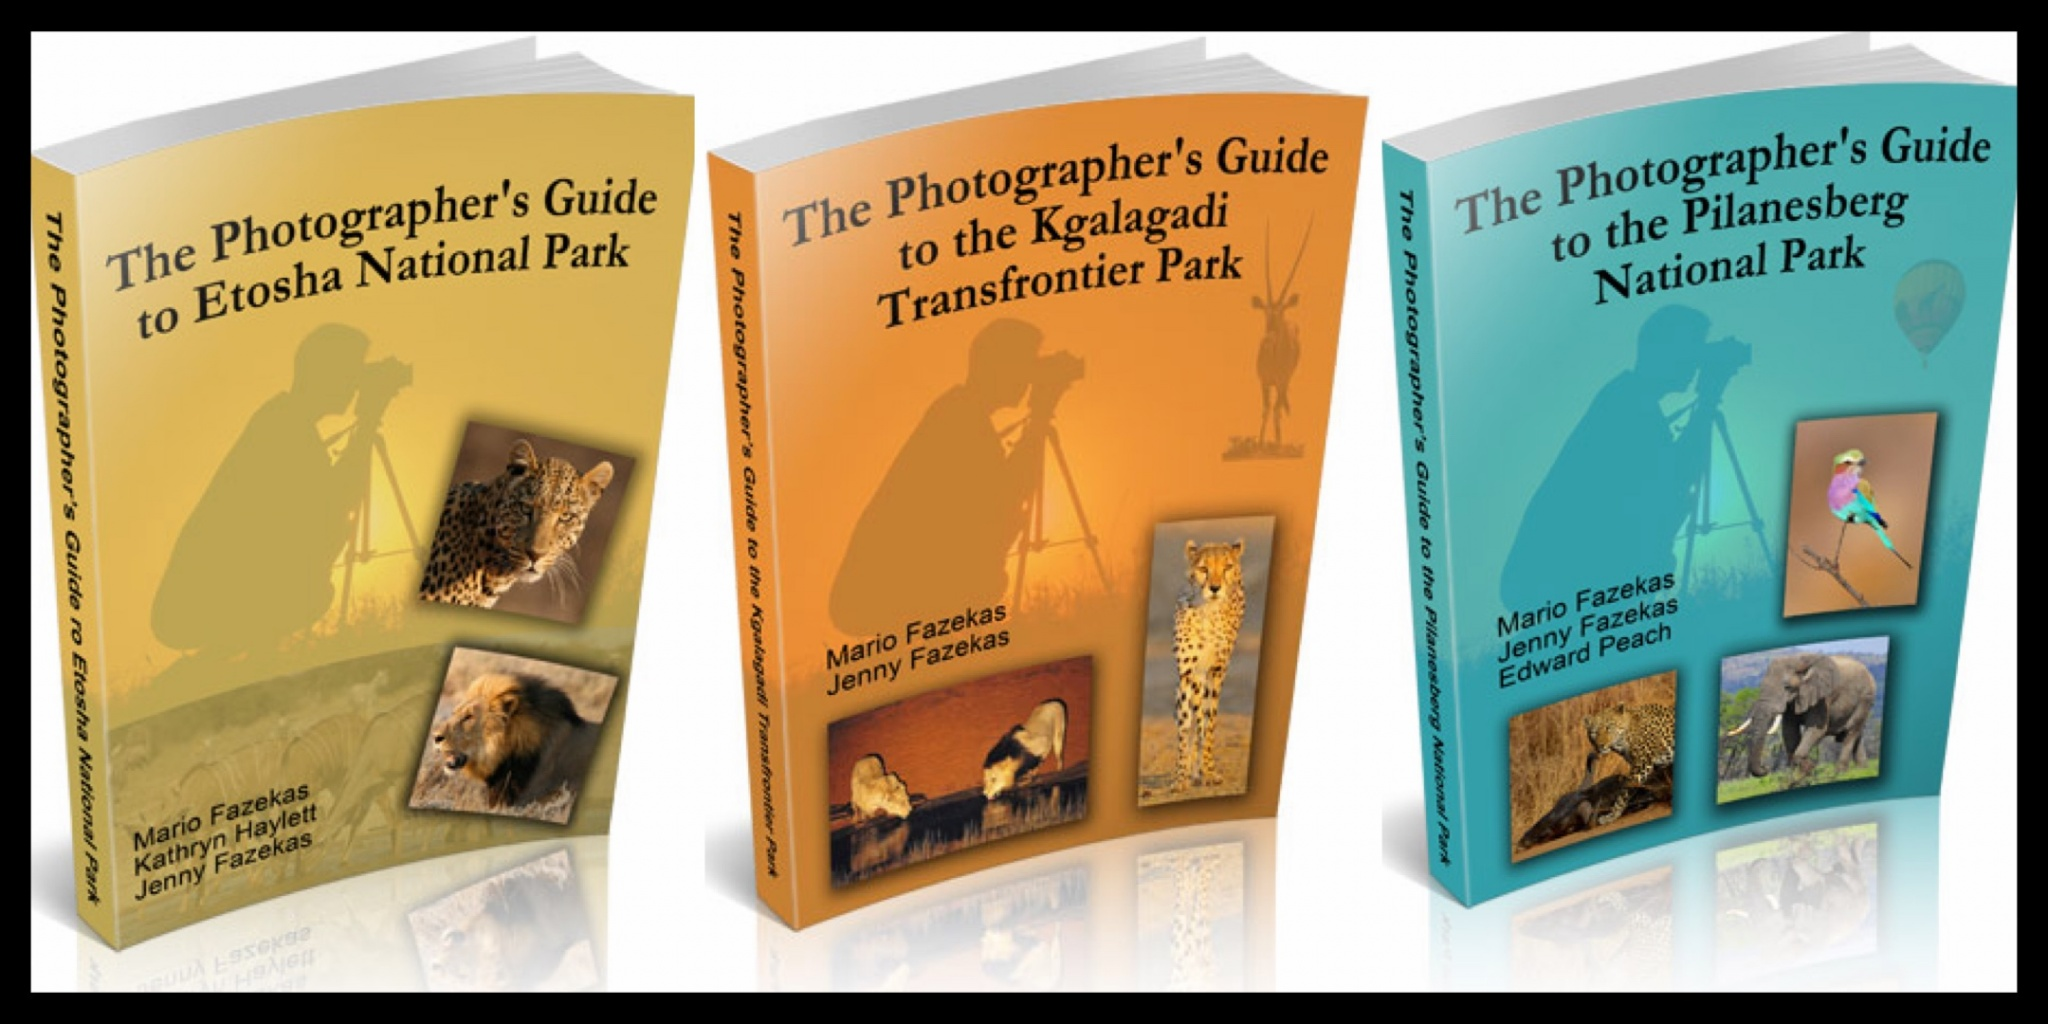 Libros recomendados     Recommended books